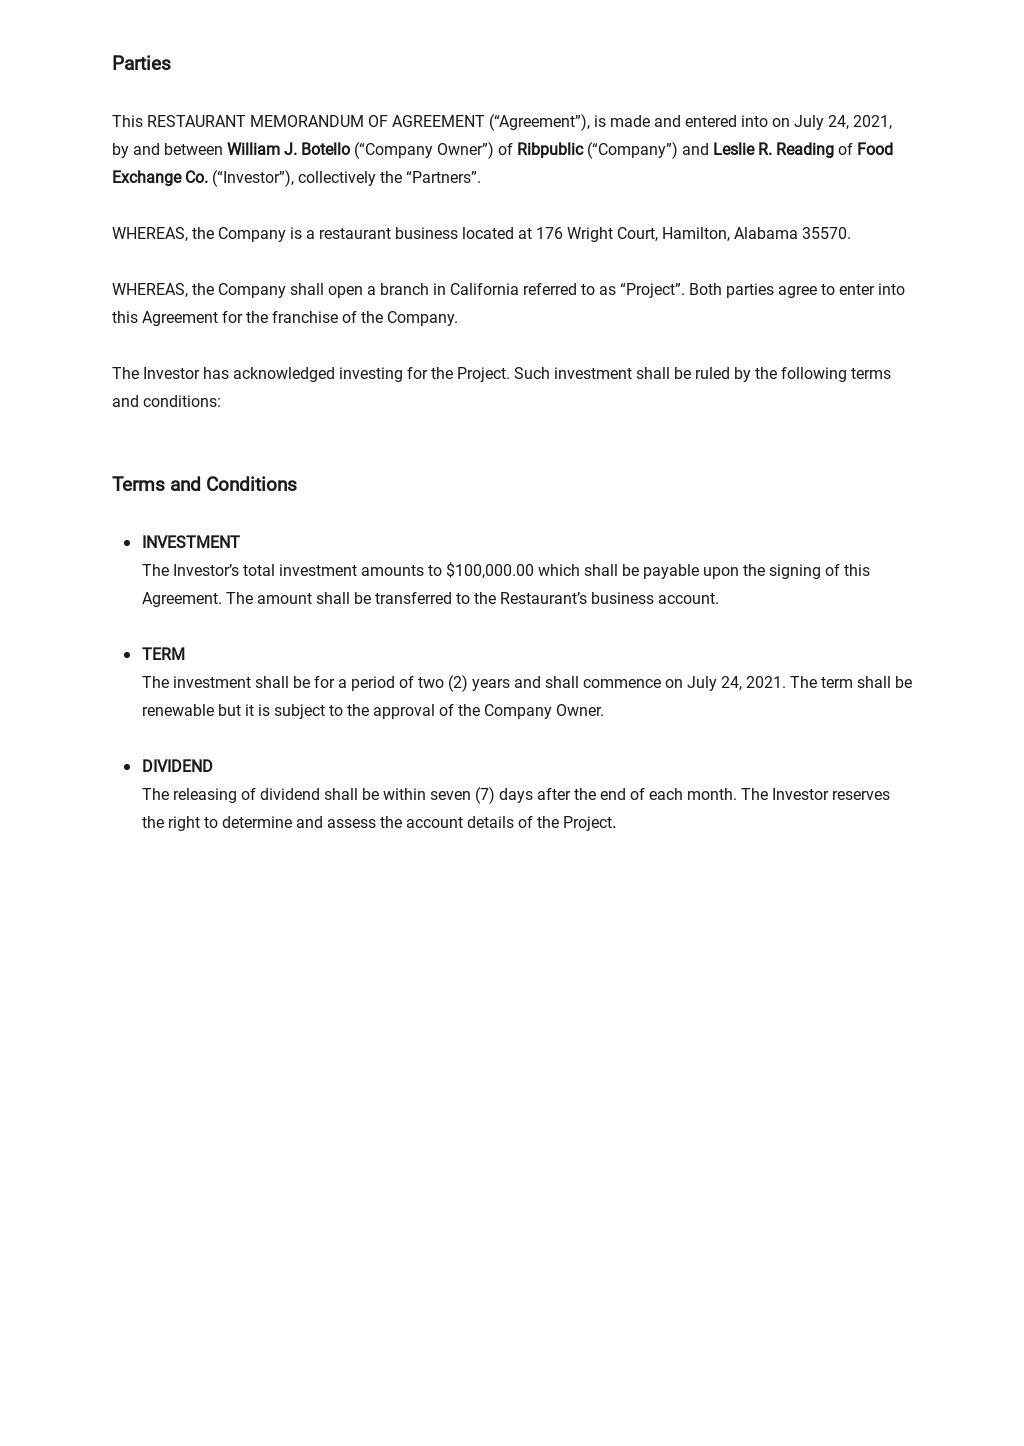 Restaurant Memorandum of Agreement Template 1.jpe